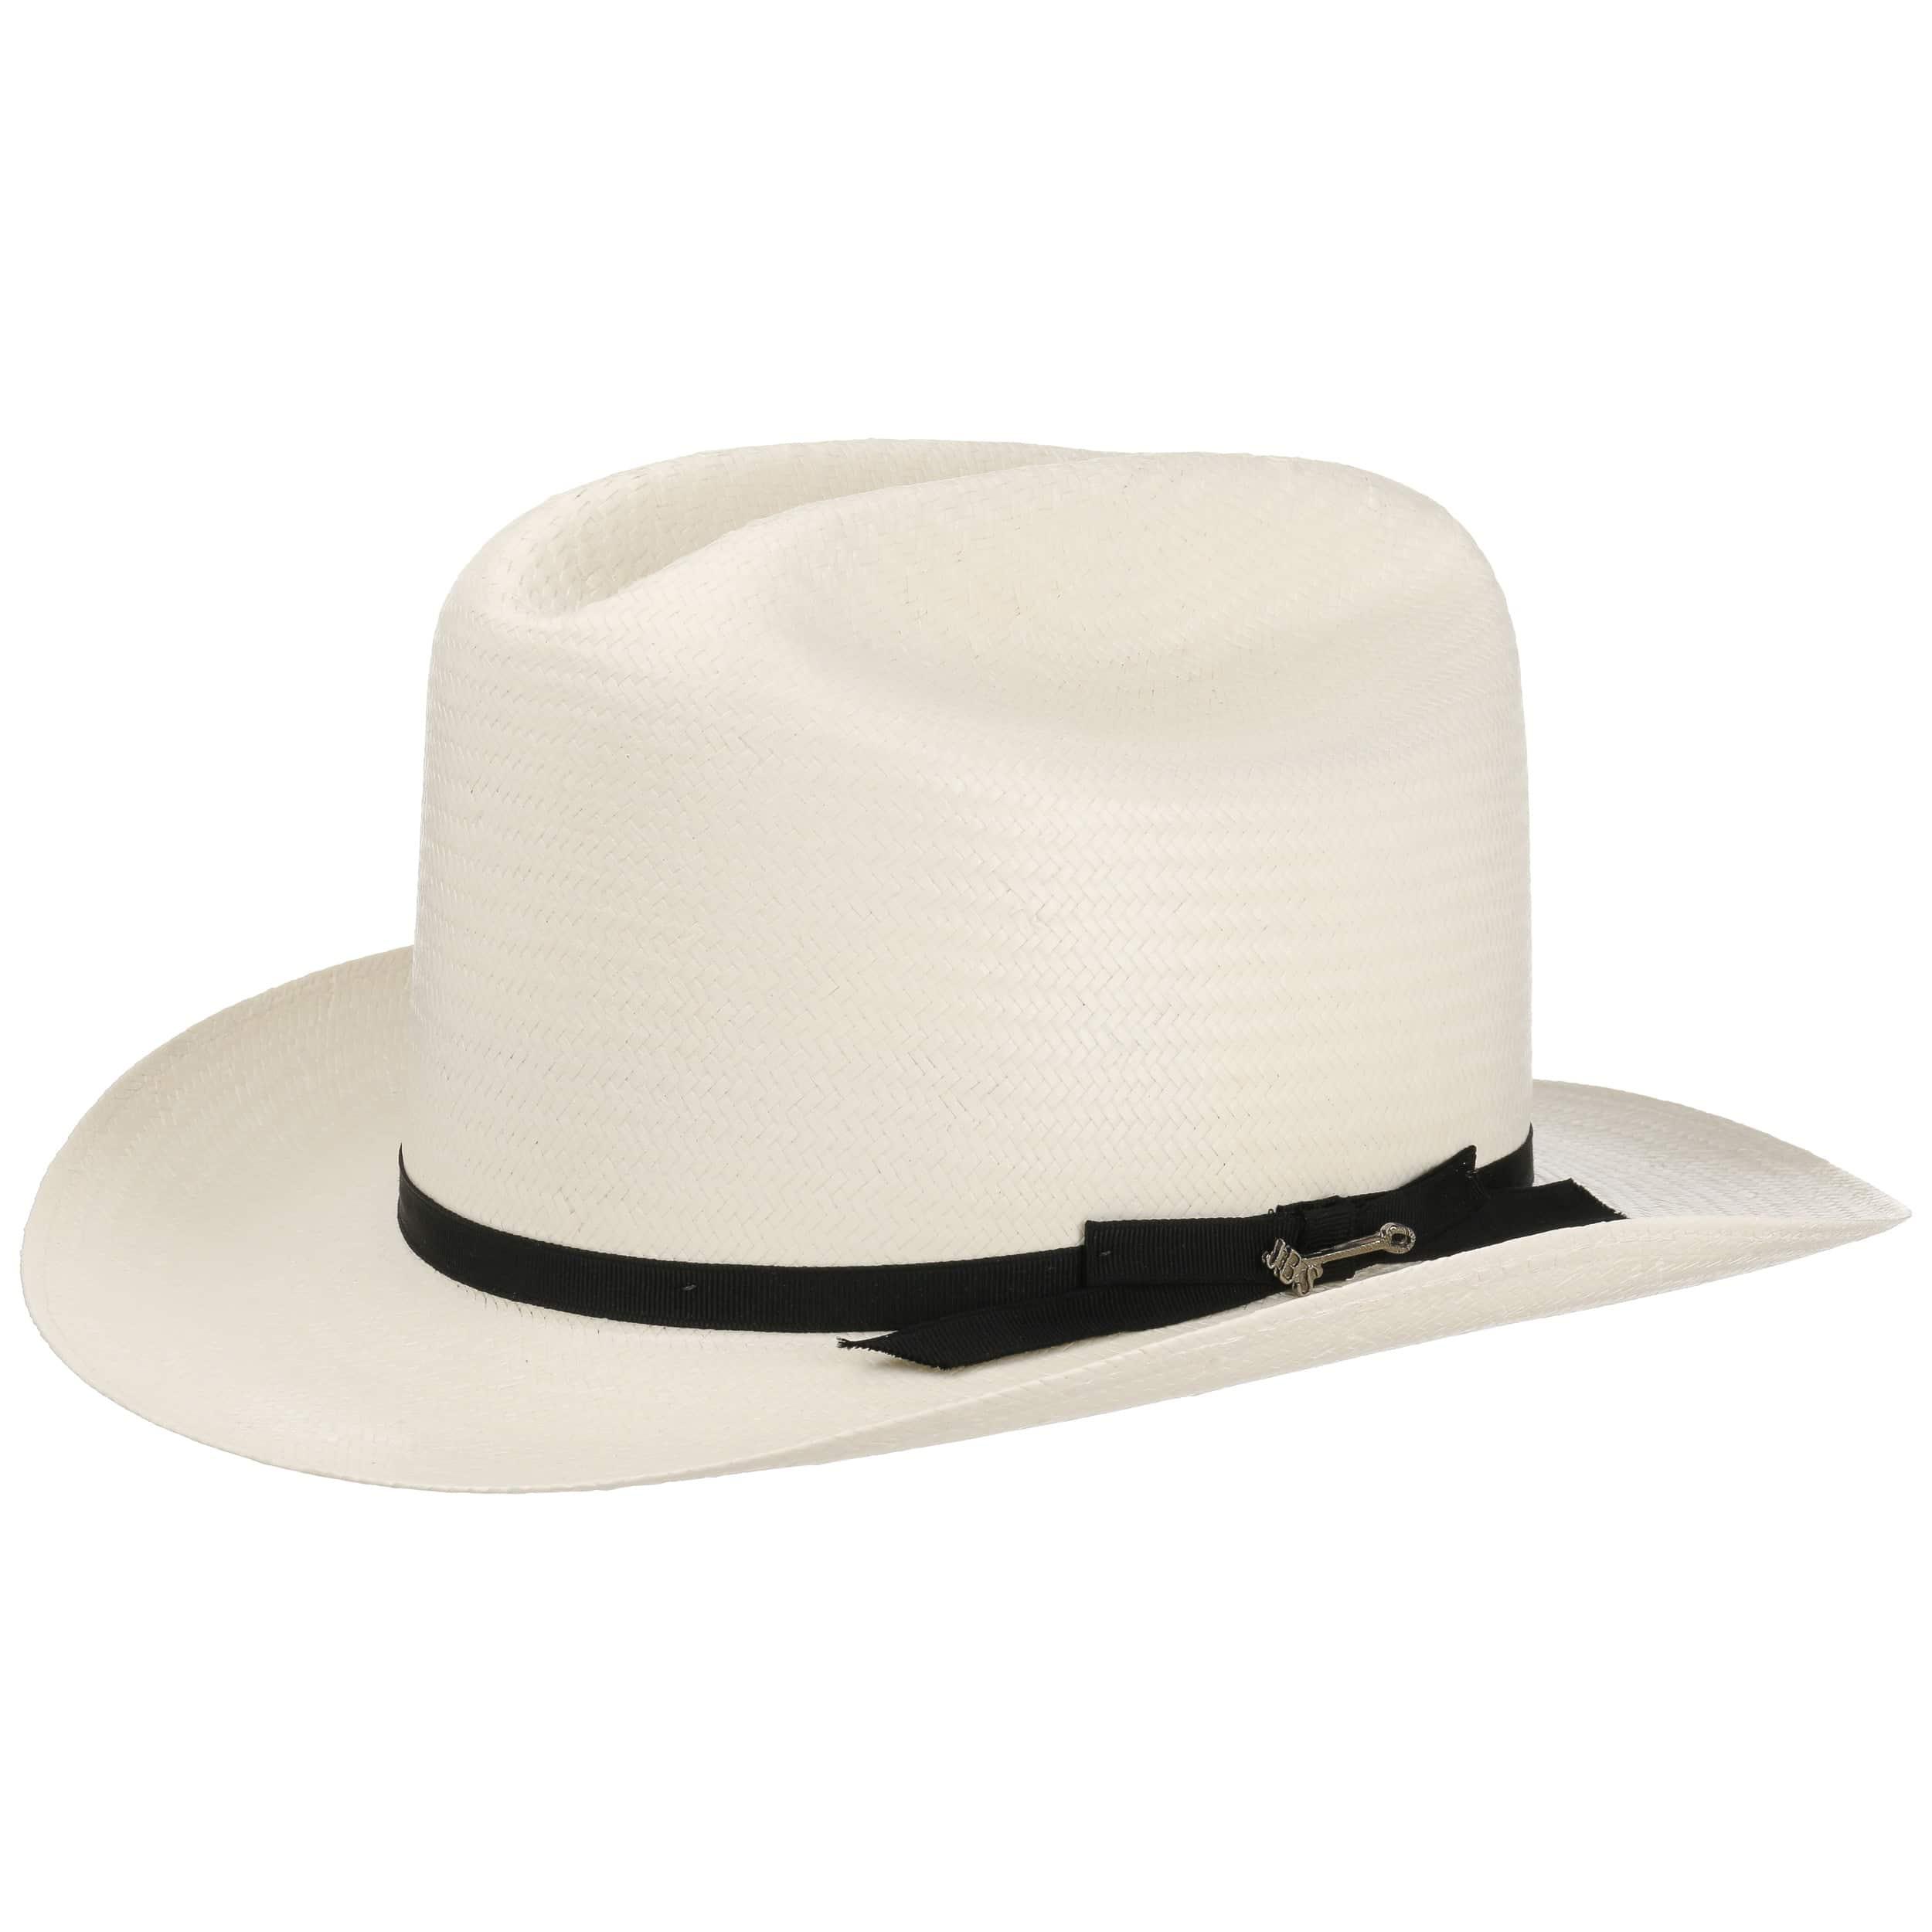 ... Open Road 6X Western Straw Hat by Stetson - cream white 6 d97793d72ba